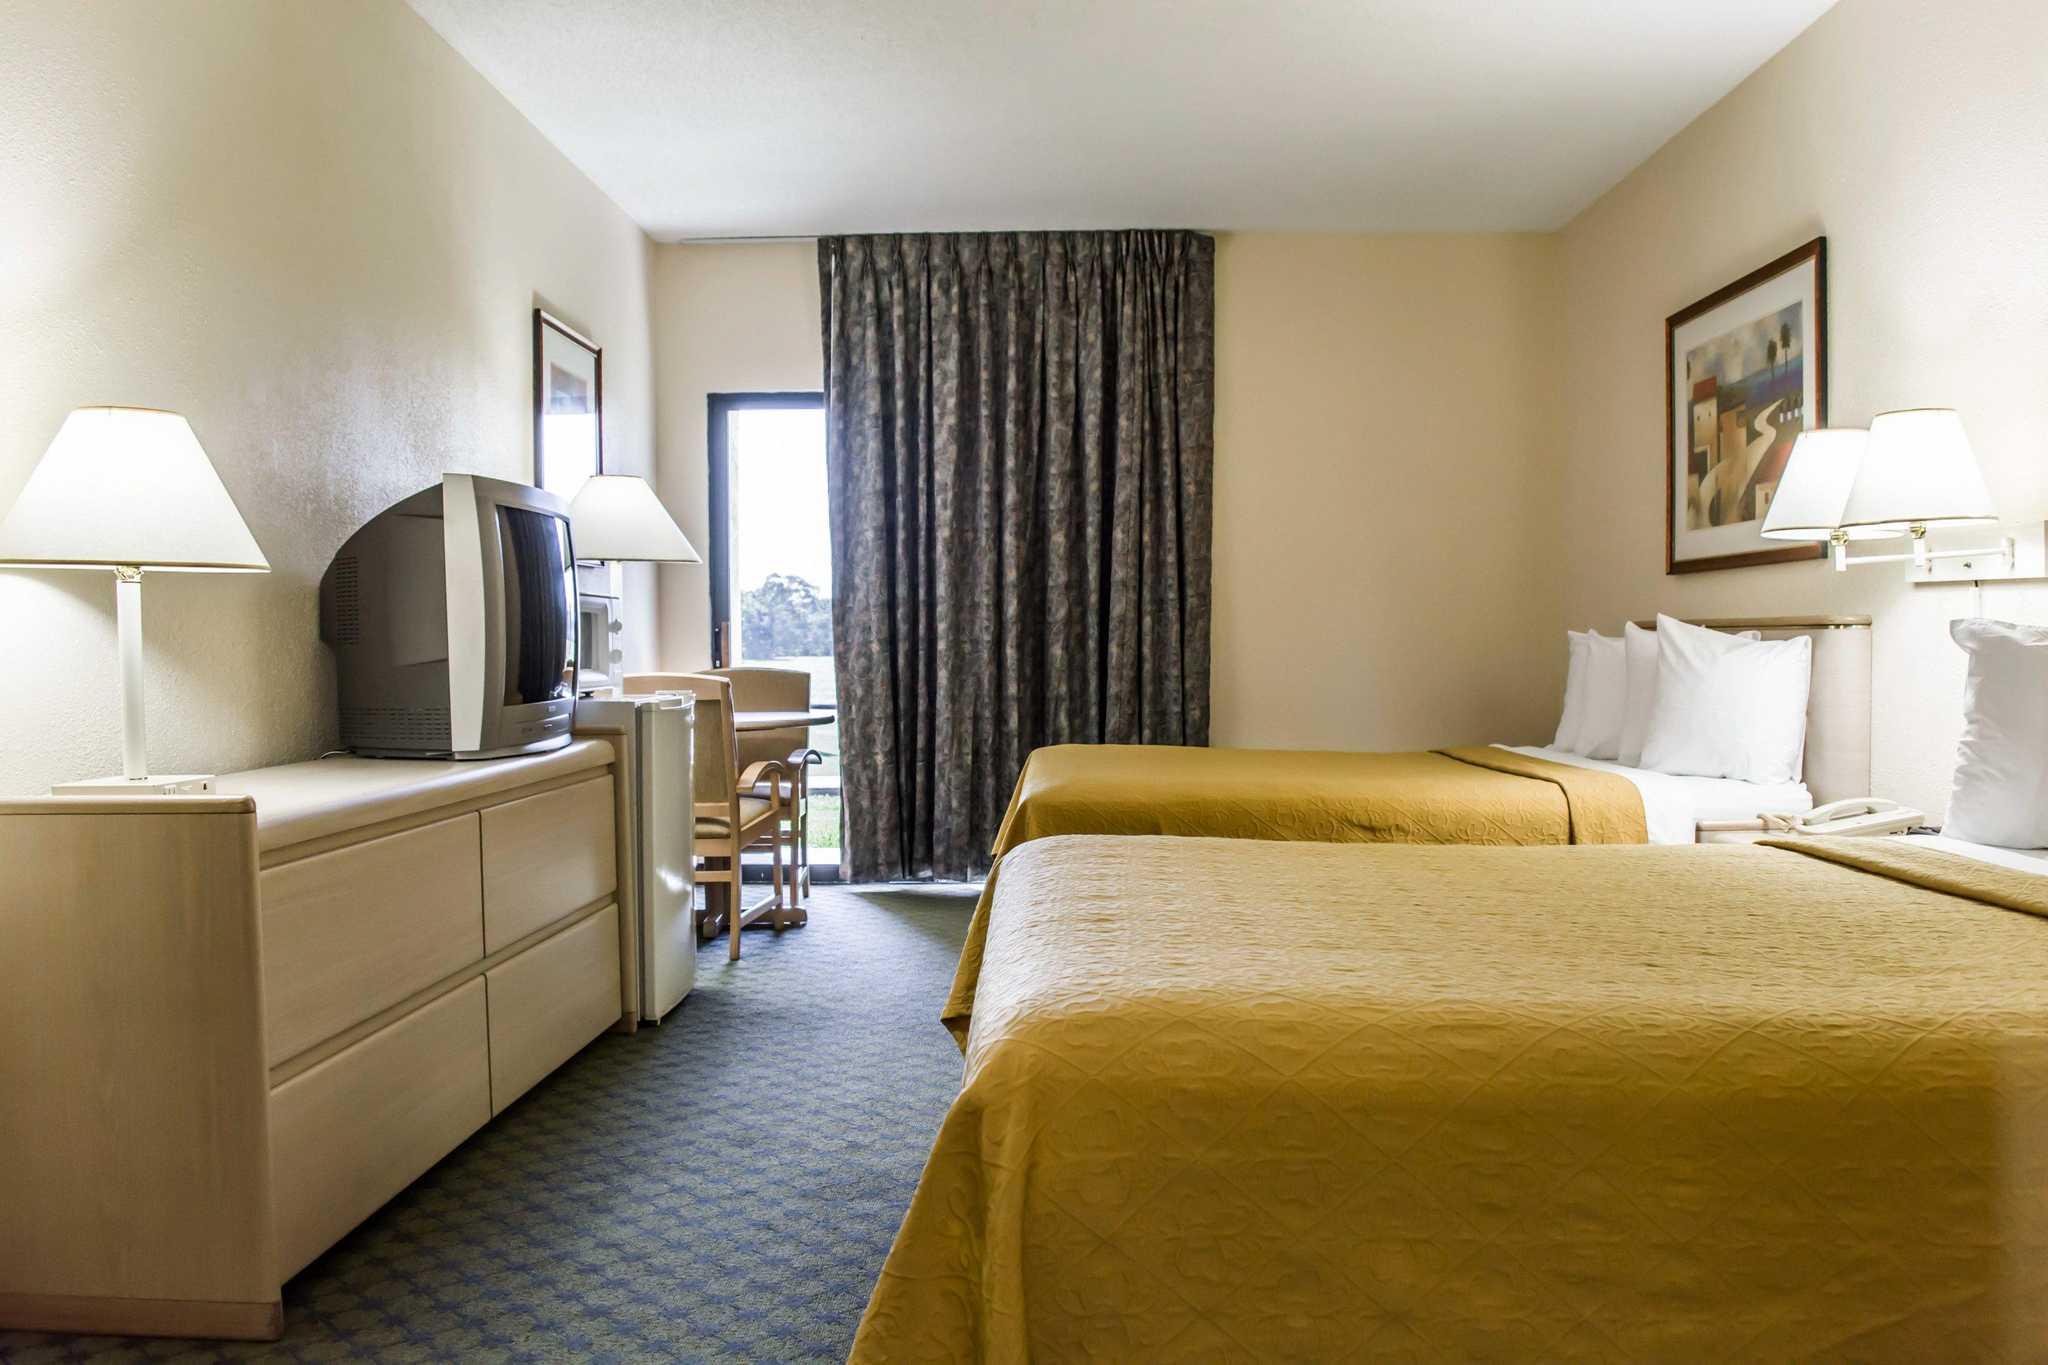 Quality Inn & Suites Golf Resort image 7